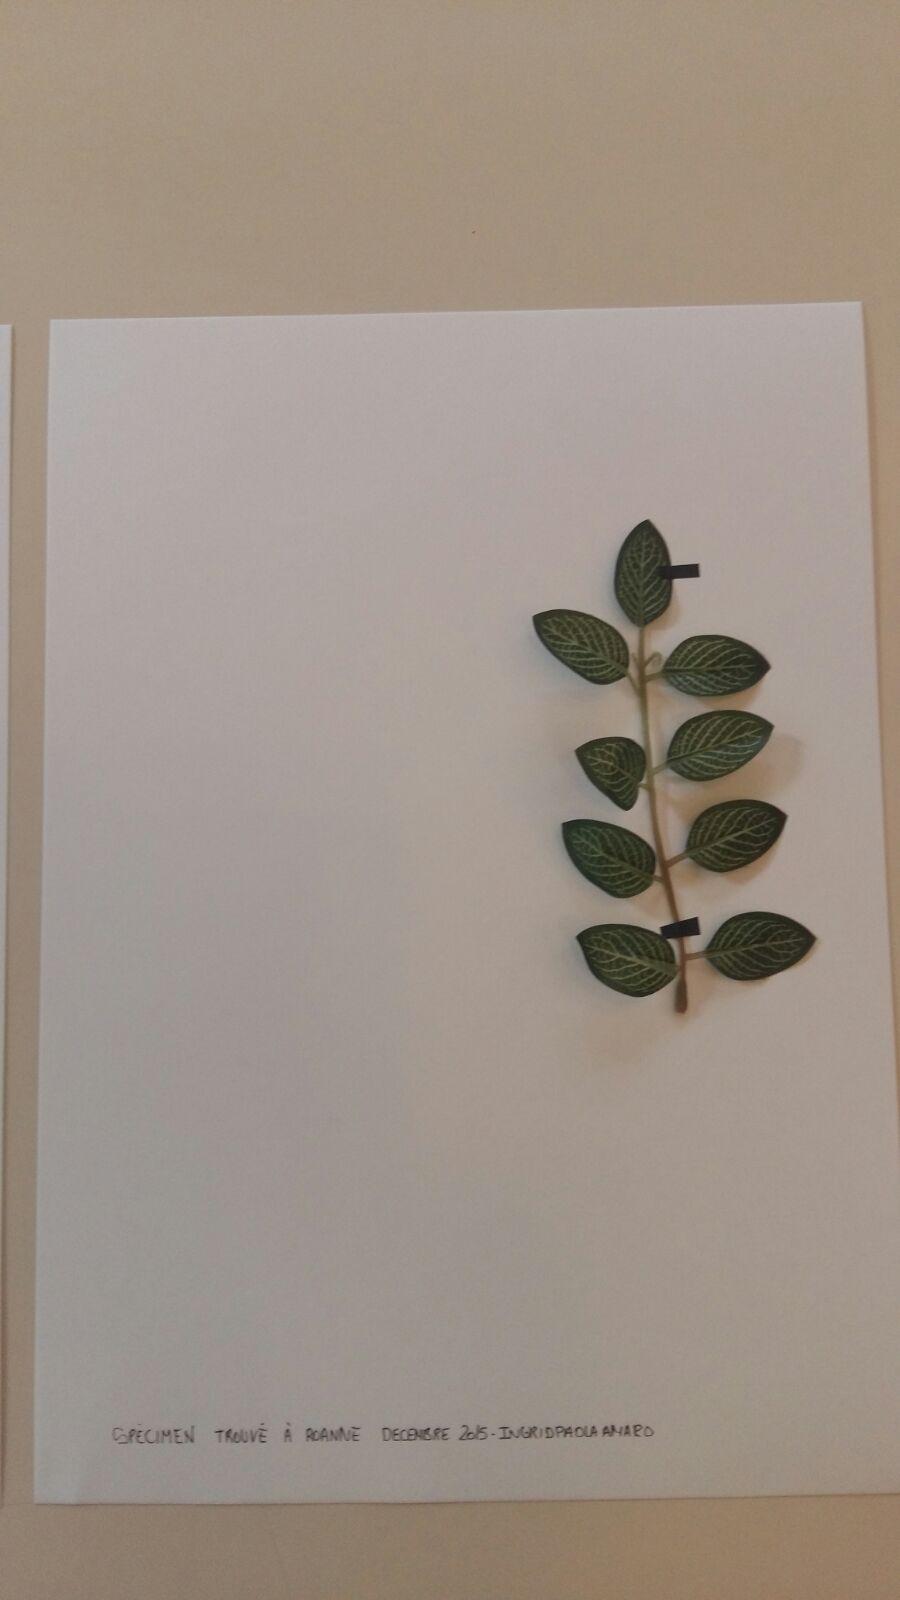 herbier-artificiel5-ingrid-paola-amaro-2016